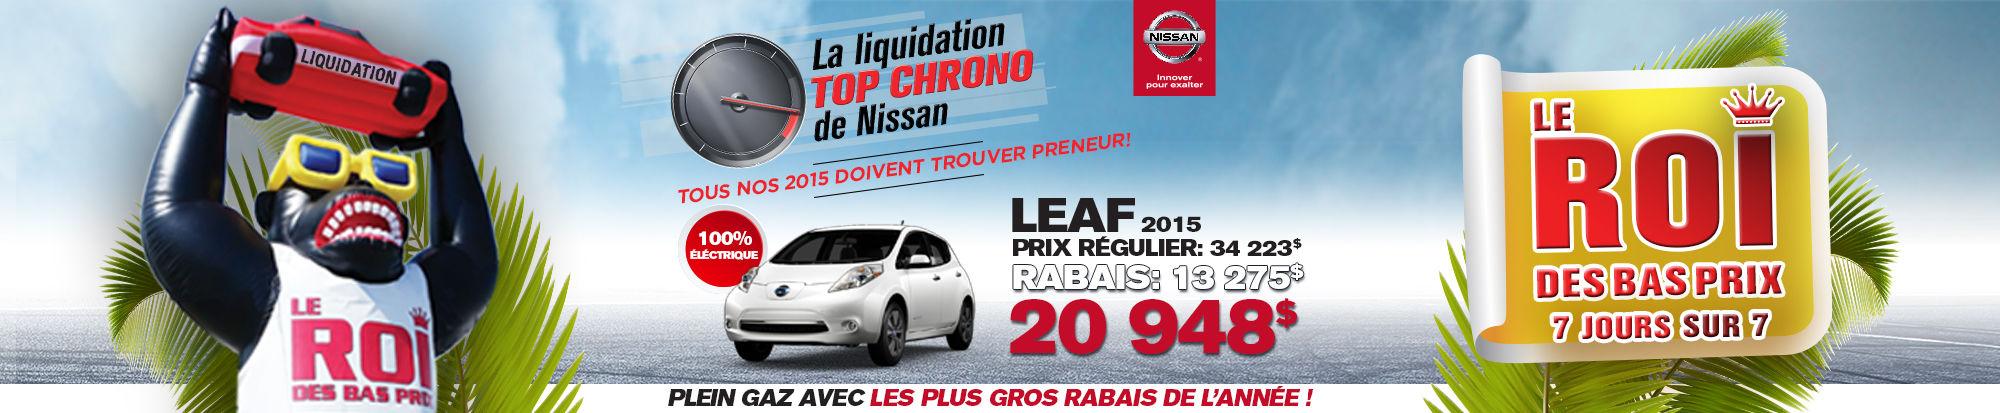 Liquidation top chrono leaf